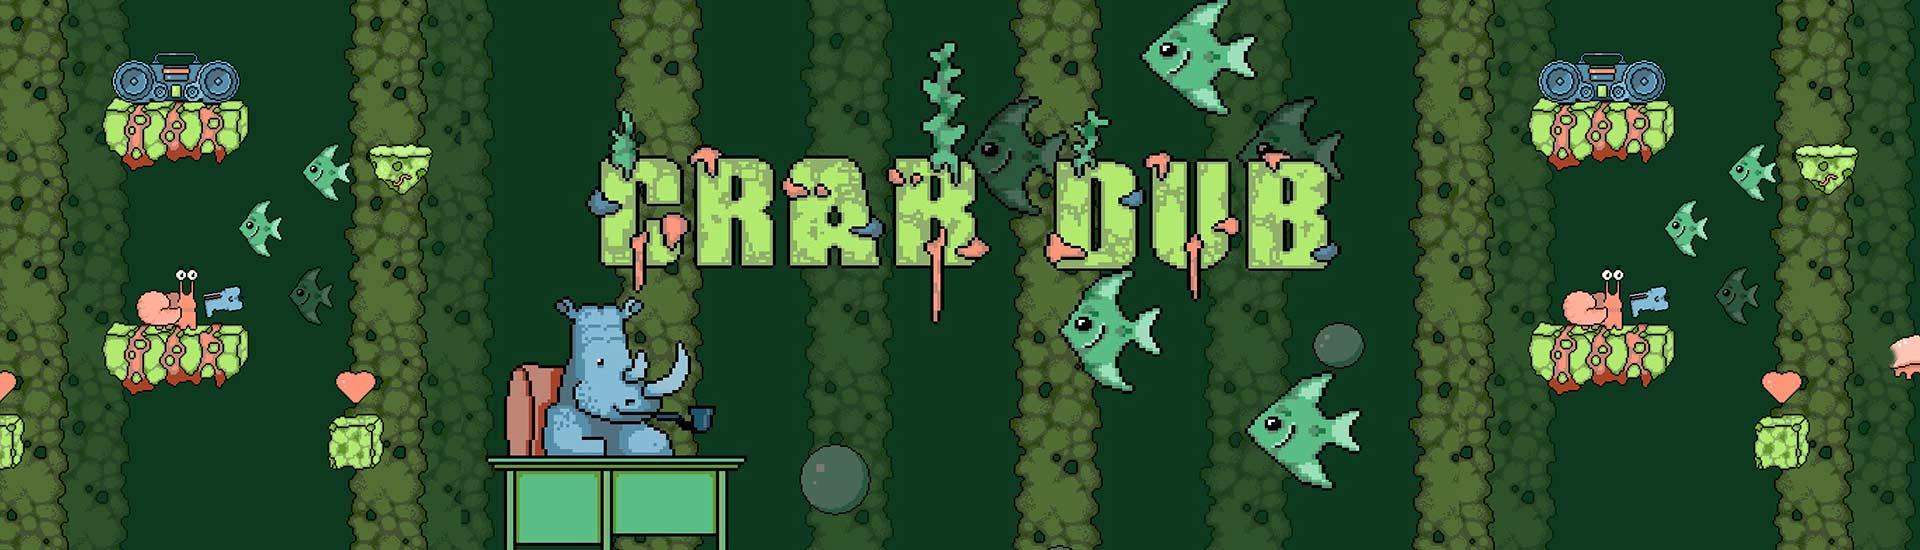 Crab Dub za darmo @Indie Gala